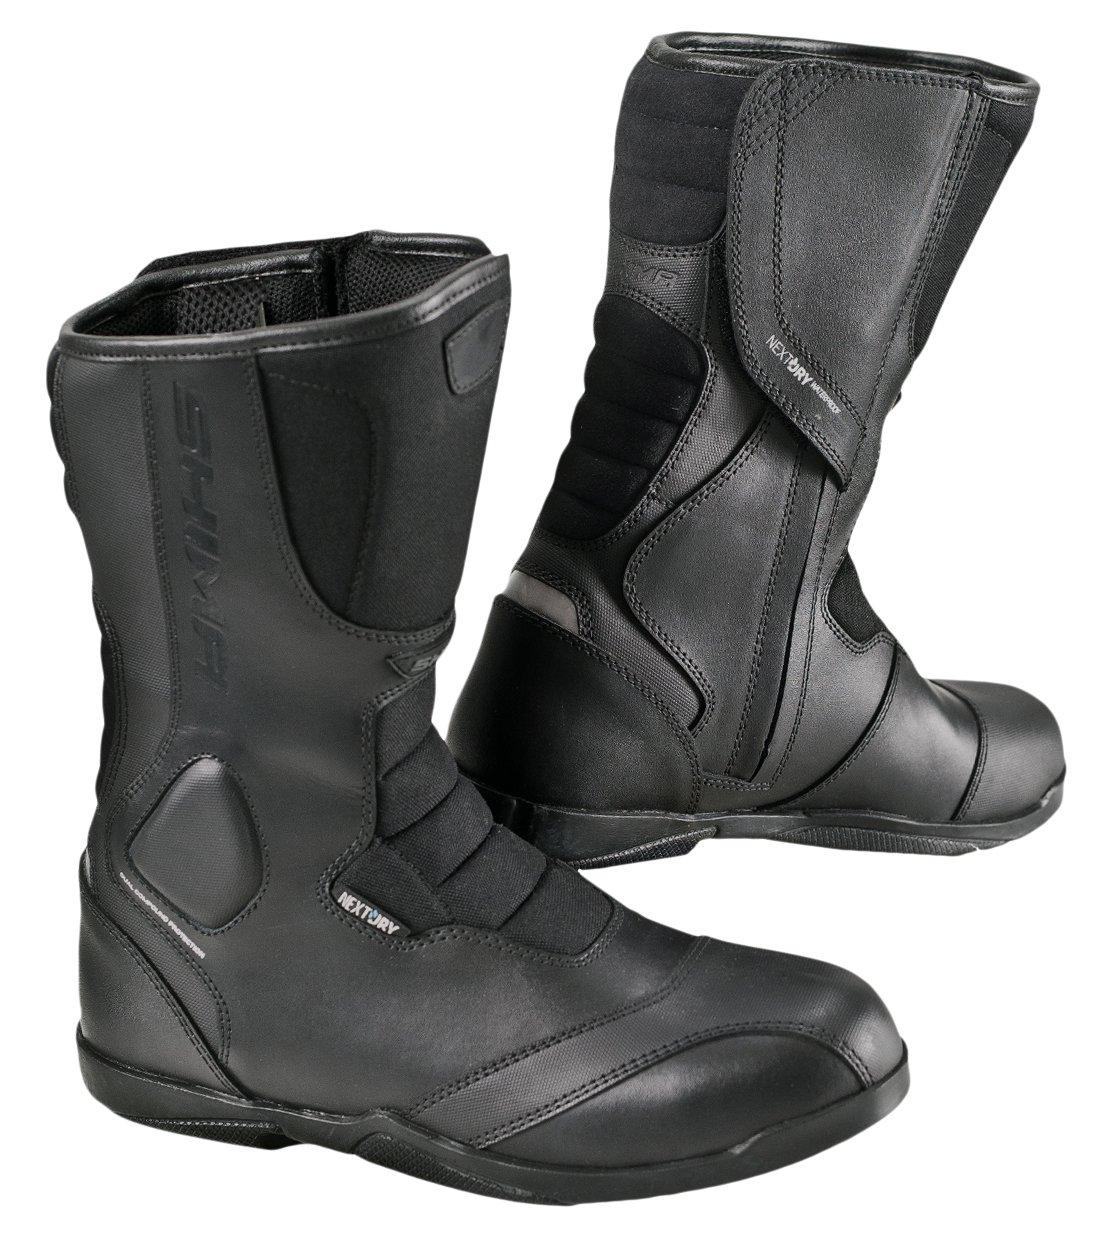 SHIMA STRADA LADY, Road Women Sport Retro Leather Classic Black Motorcycle Boots (39, Black)